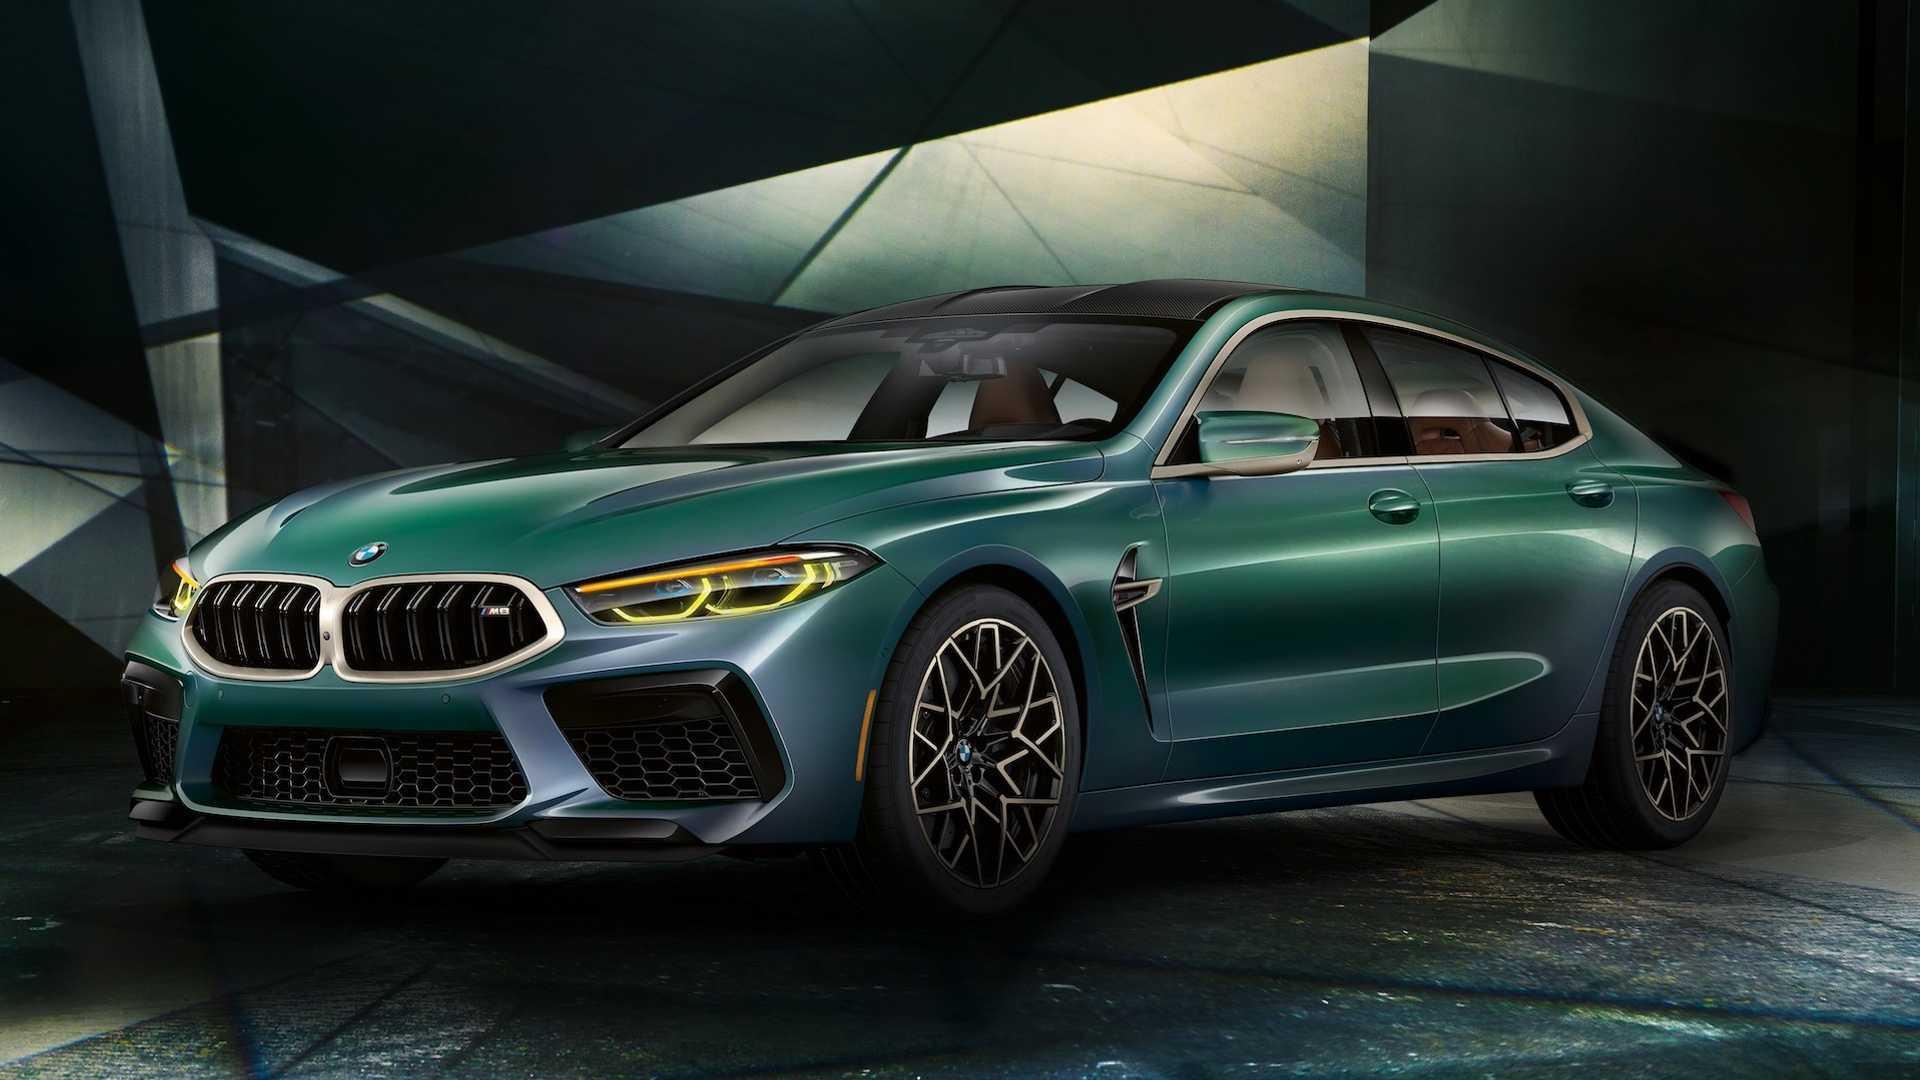 2020-bmw-m8-gran-coupe-7.jpg